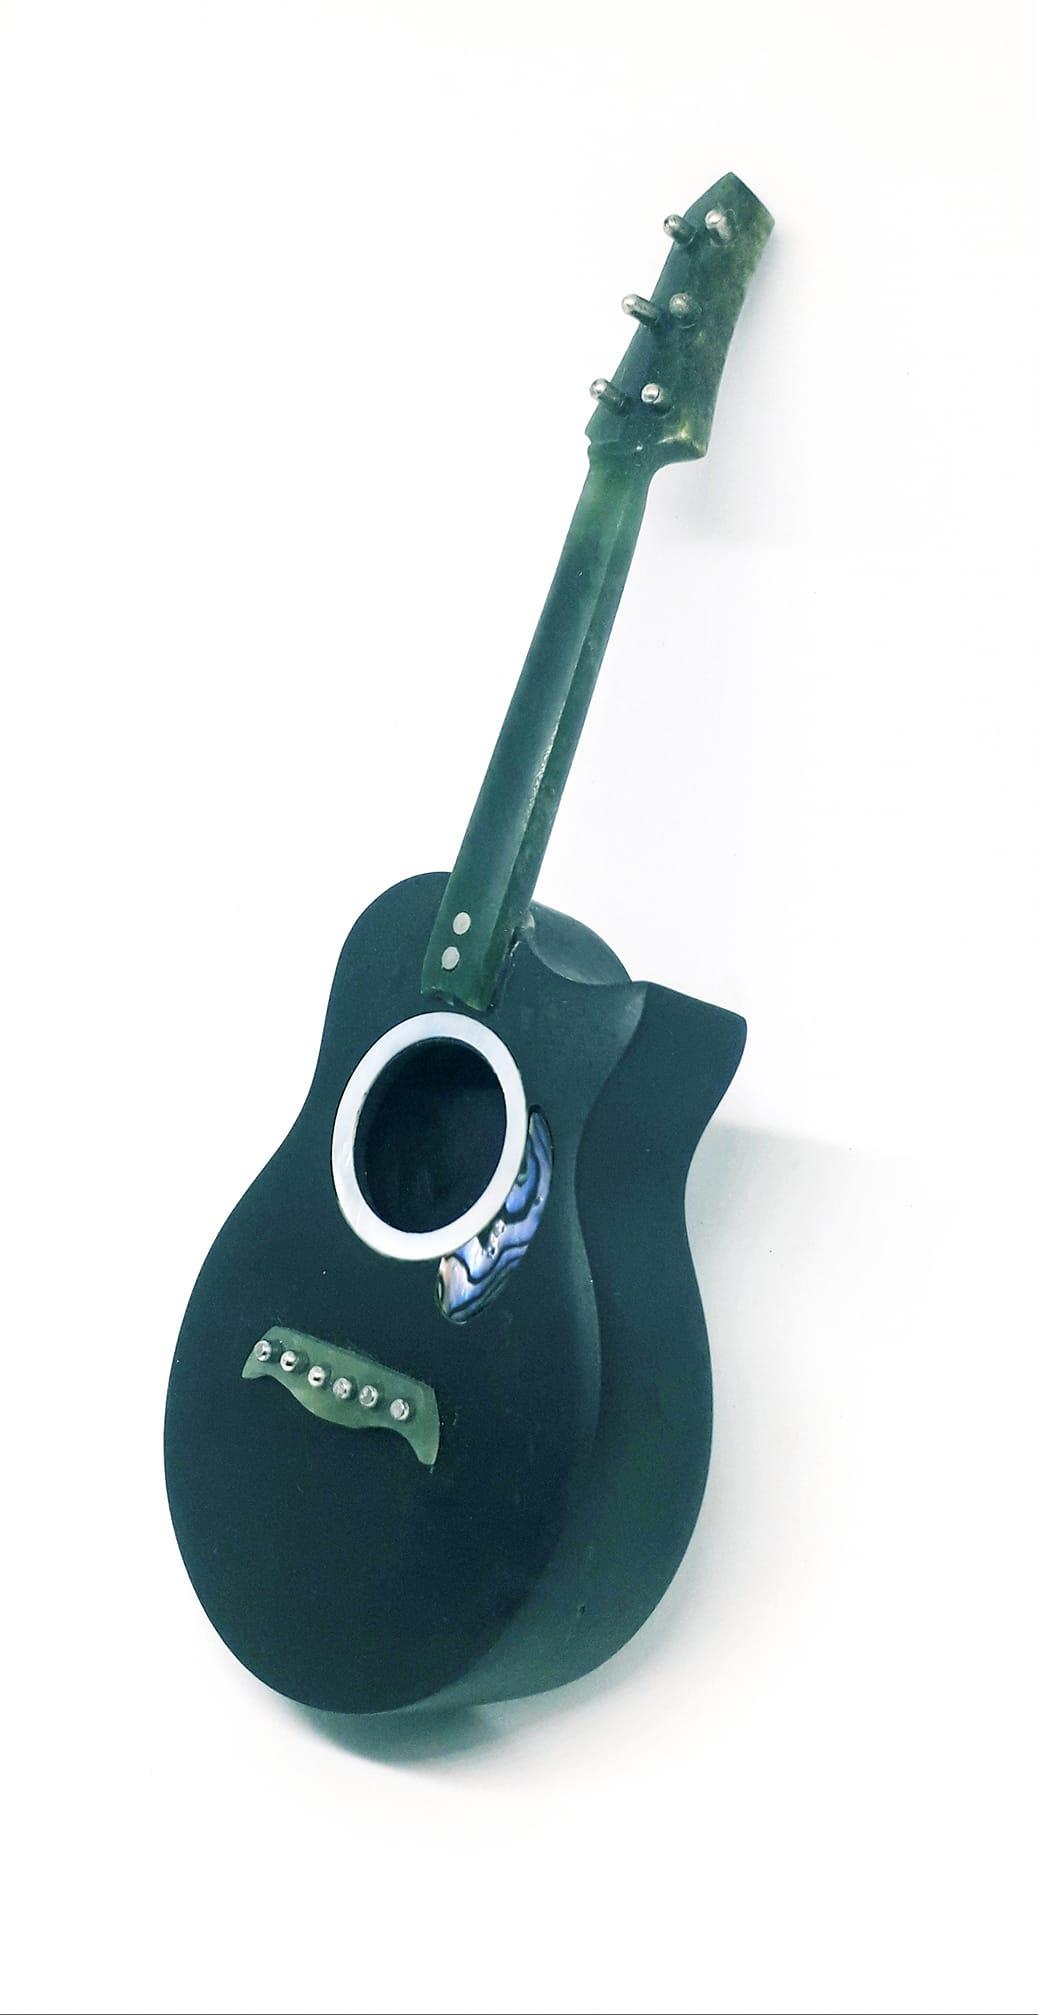 N.z Greenstone Pounamu Acoustic guitar on pakohe base